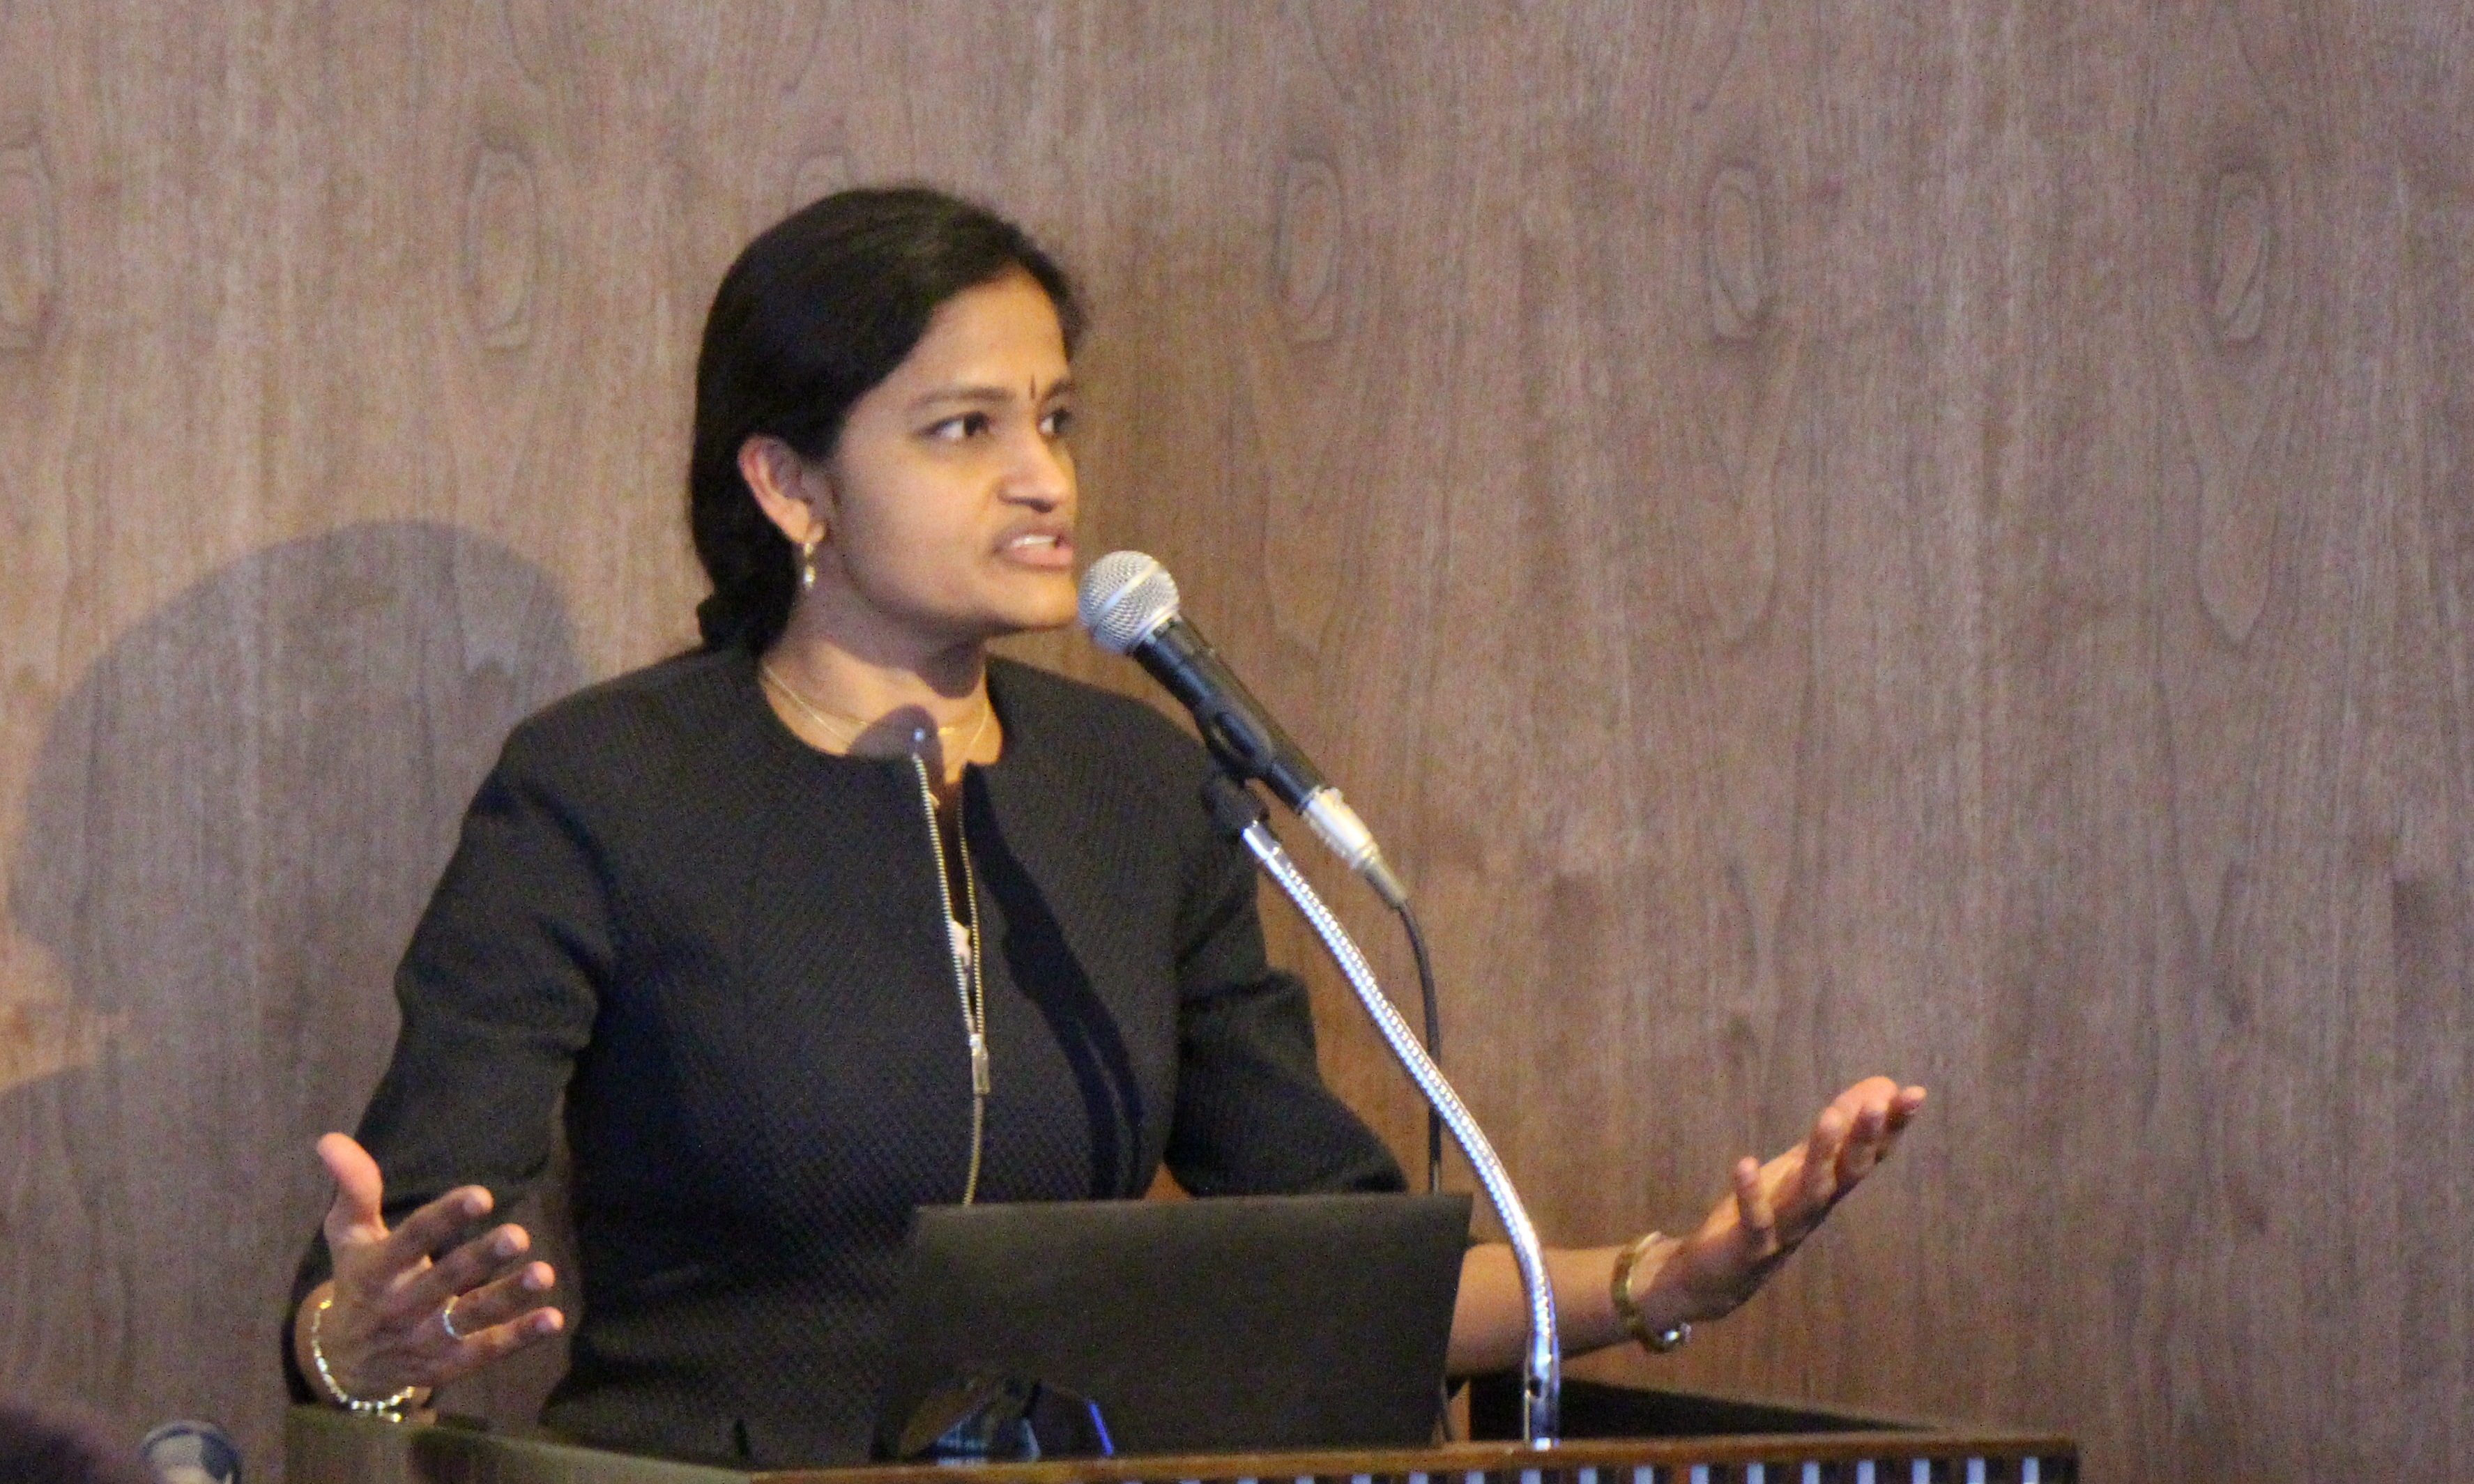 【開催報告】第34回特別朝食会「Access to Medicineインデックス2016」 Jayasree K. lyer氏(2016年11月24日)